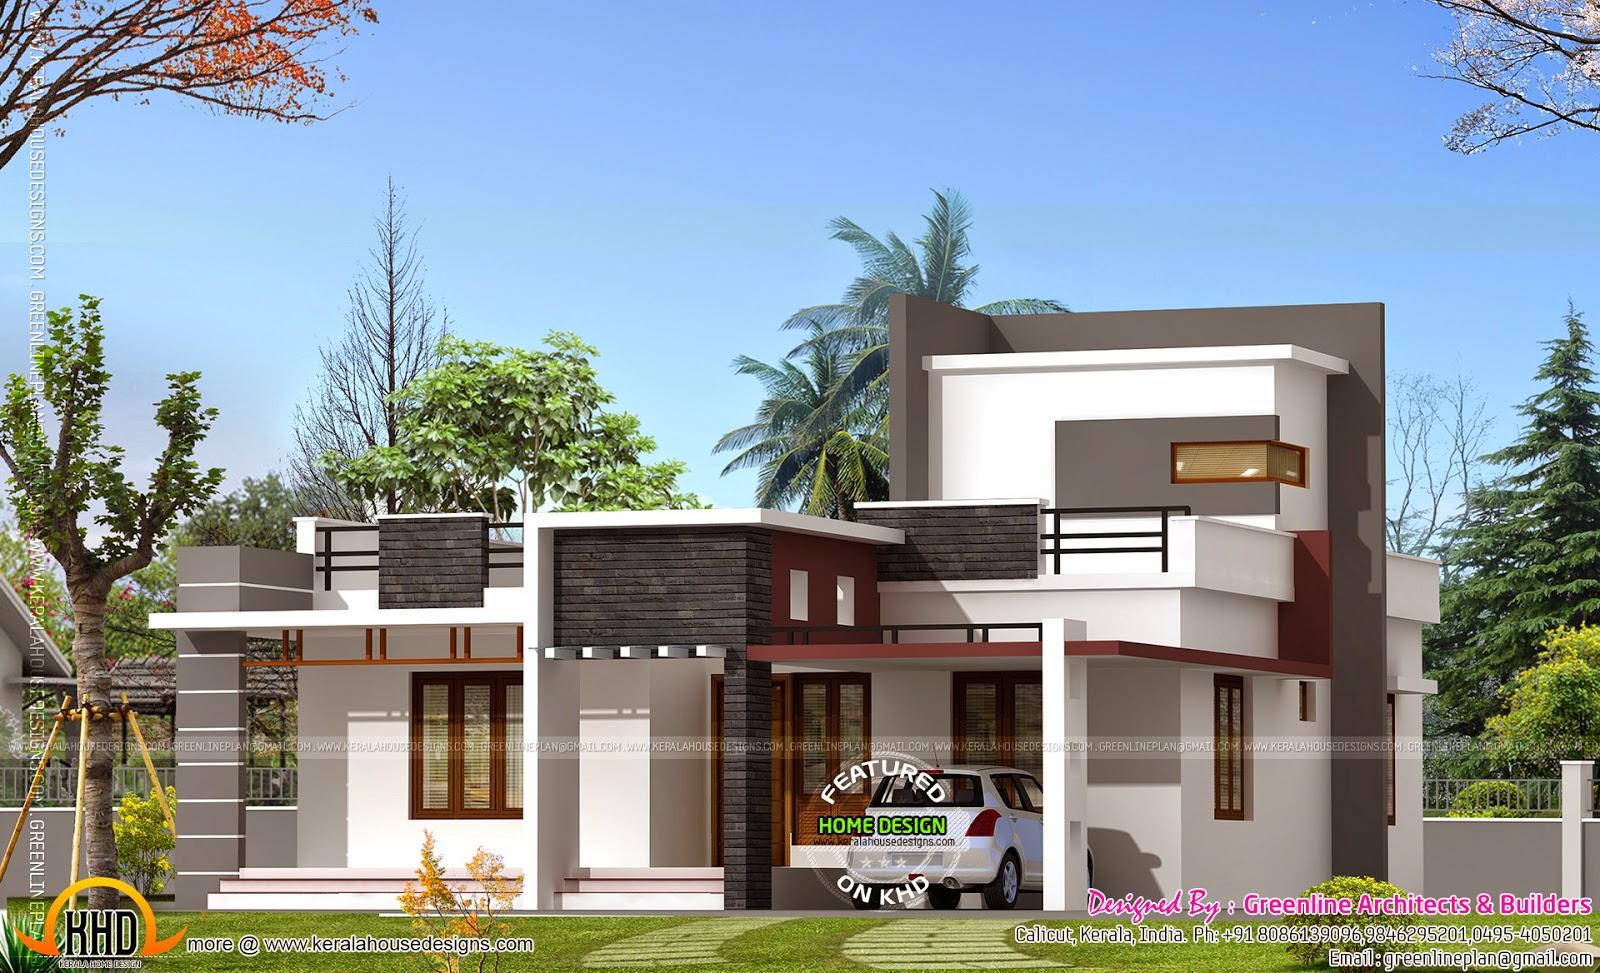 plans kerala model house plans designs sq ft home kerala home plan elevation sq ft kerala home design